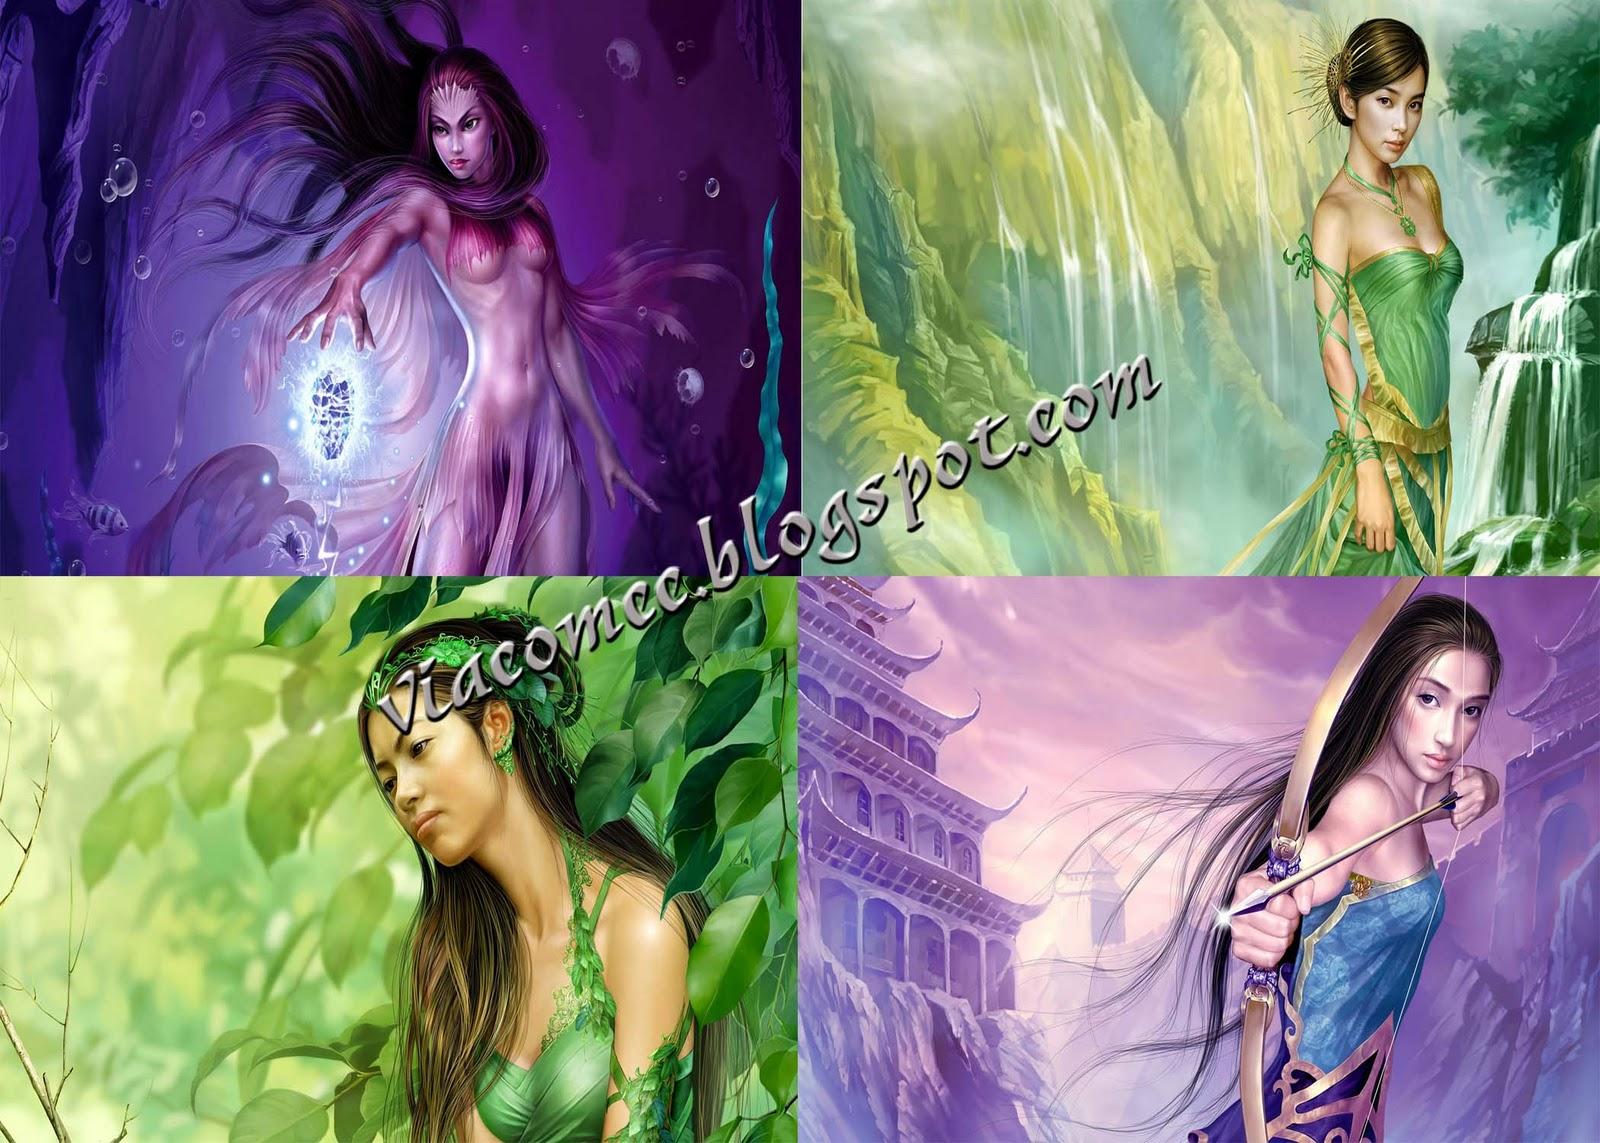 http://4.bp.blogspot.com/_RphxnciltFY/TNAqCsDVX4I/AAAAAAAAASE/T9jHKkFl4Ag/s1600/Amazing+Girls+25-37.jpg